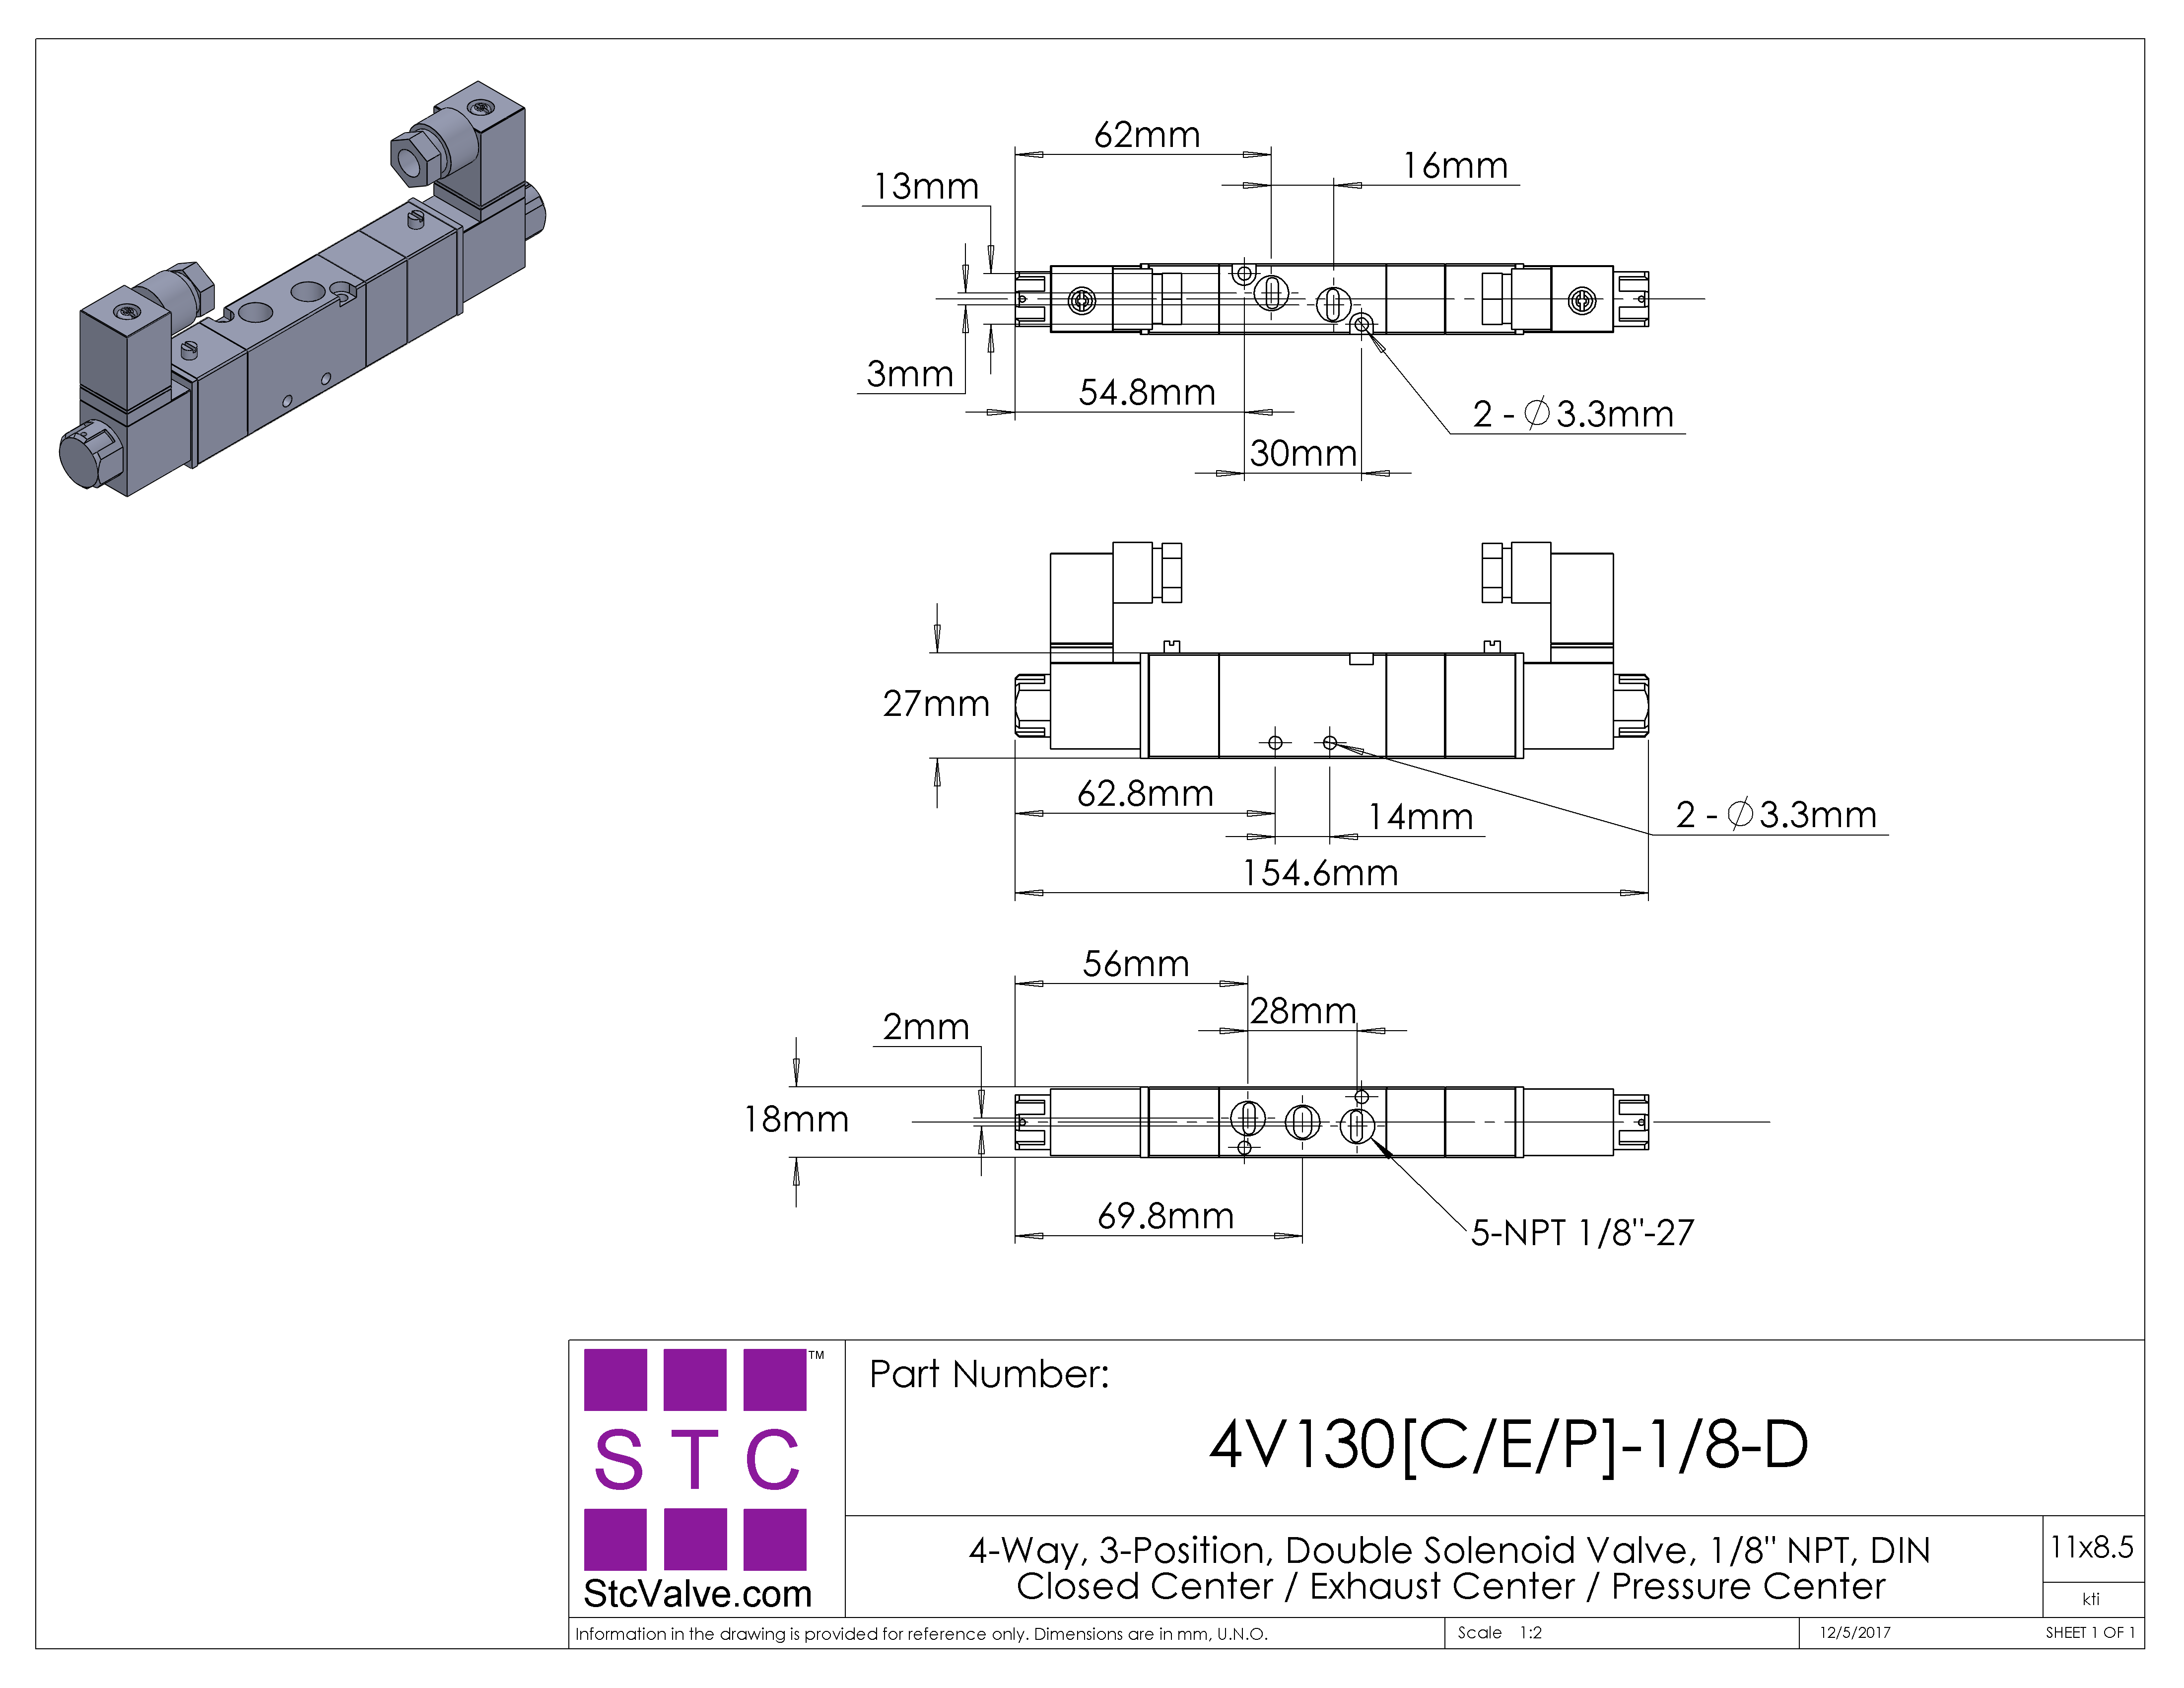 4V130[CEP]-1/8: 4-Way, 3-Position Directional Solenoid Valve on 4-way ball valve diagram, 4-way directional valve, 4-way pneumatic valve, 4-way valve symbol, pilot operated solenoid valve schematic, 4-way air valve schematic, 4-way ball valve schematic,